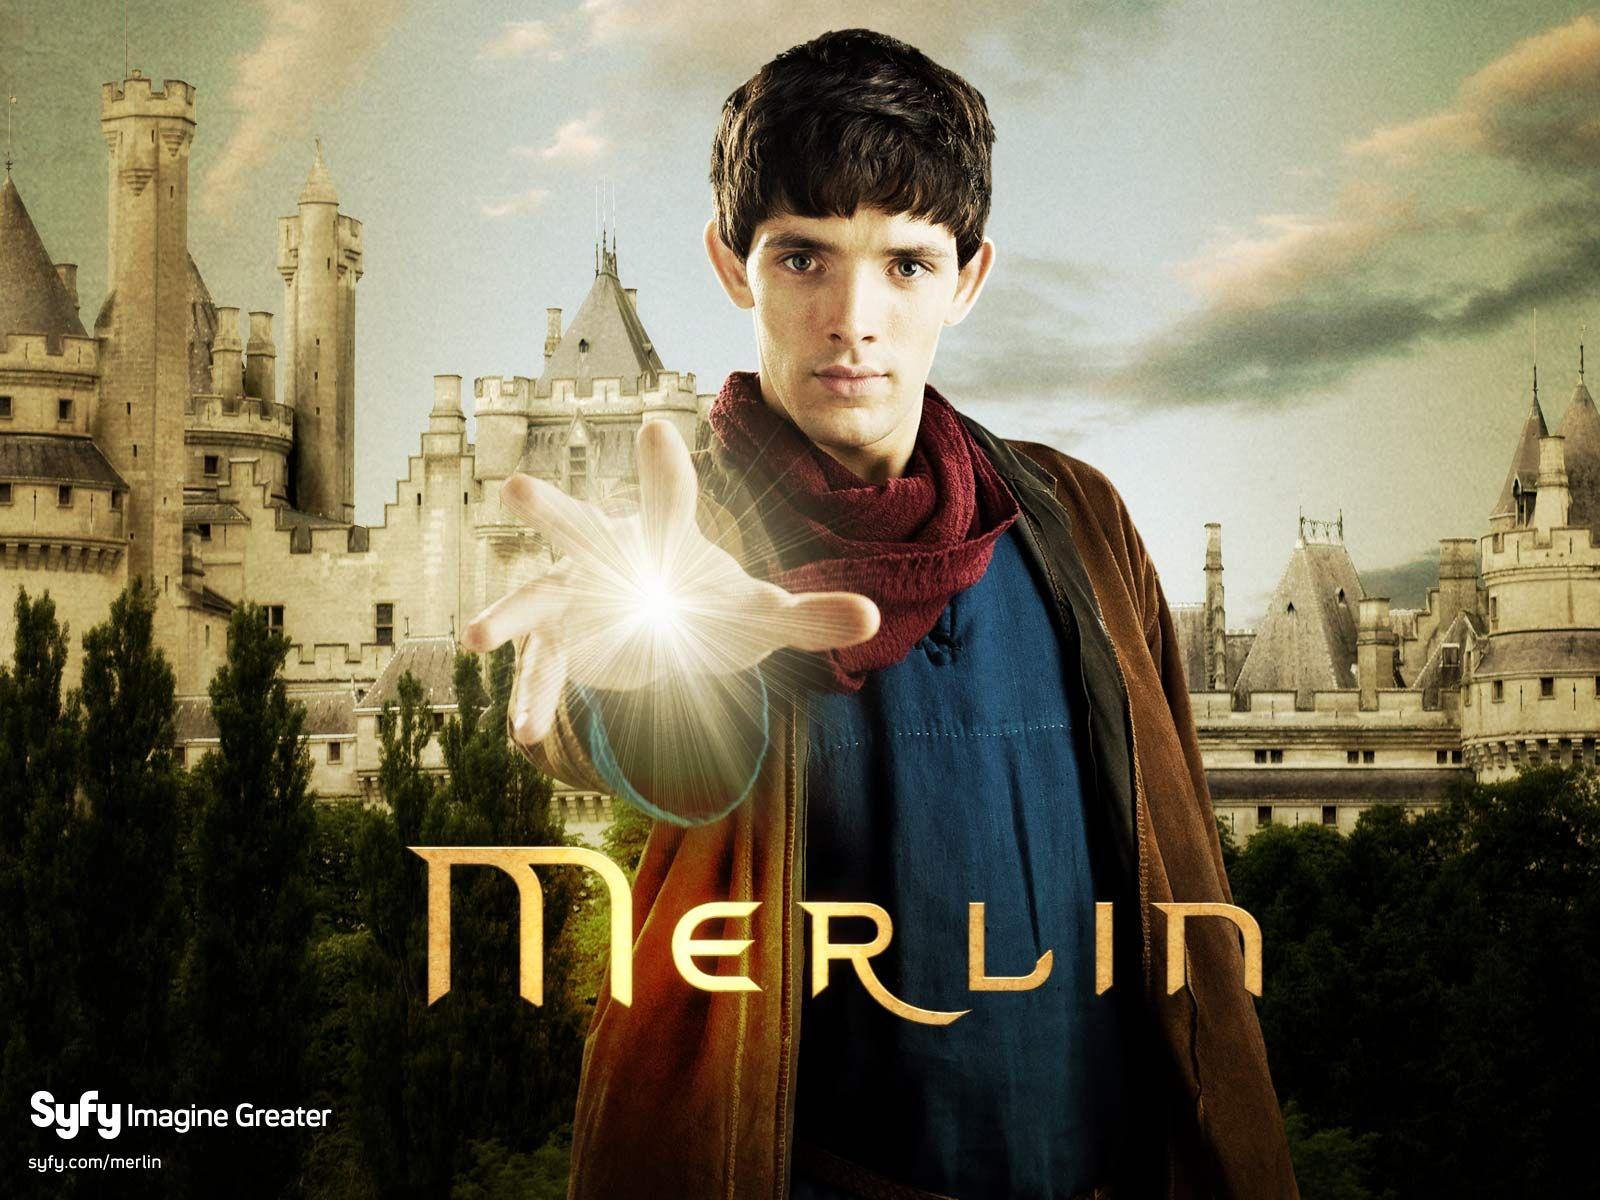 Merlin Tv Show Merlin Wallpaper 20027607 Size 1280x1024 More